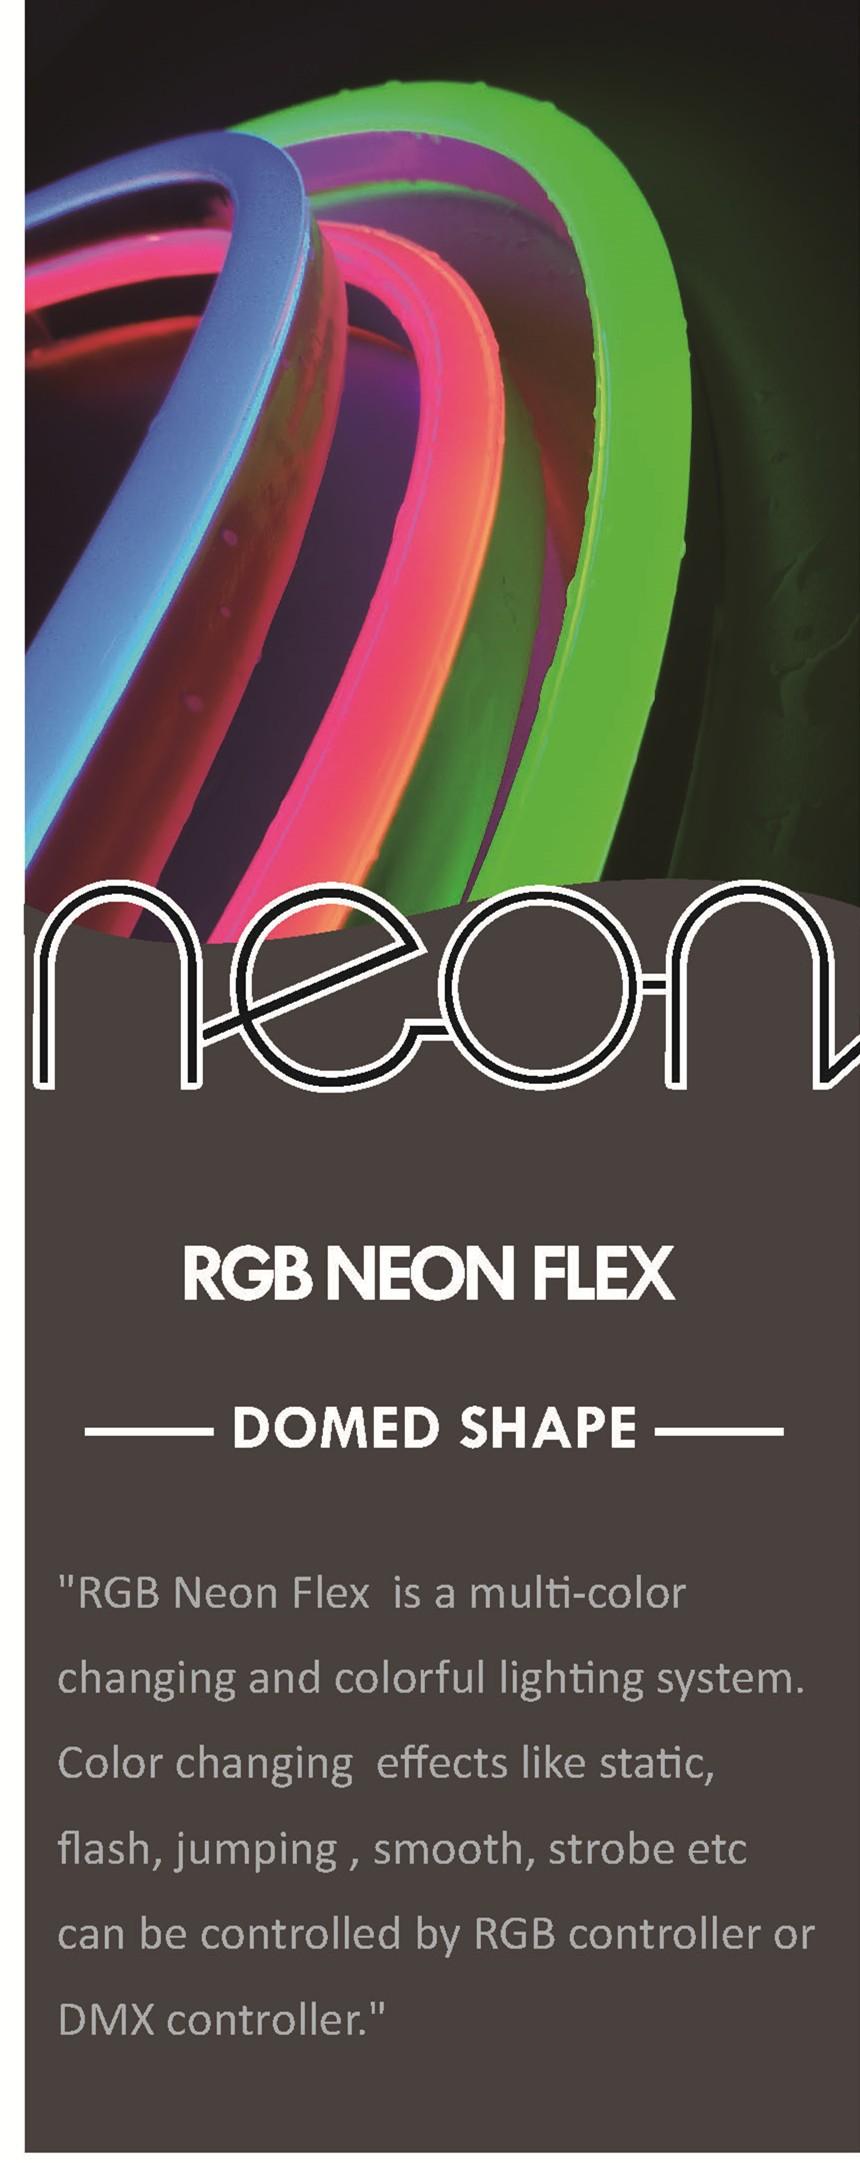 Led Neon Flex Manufacturer Flexible Led Neon Rope Light Lamps ...